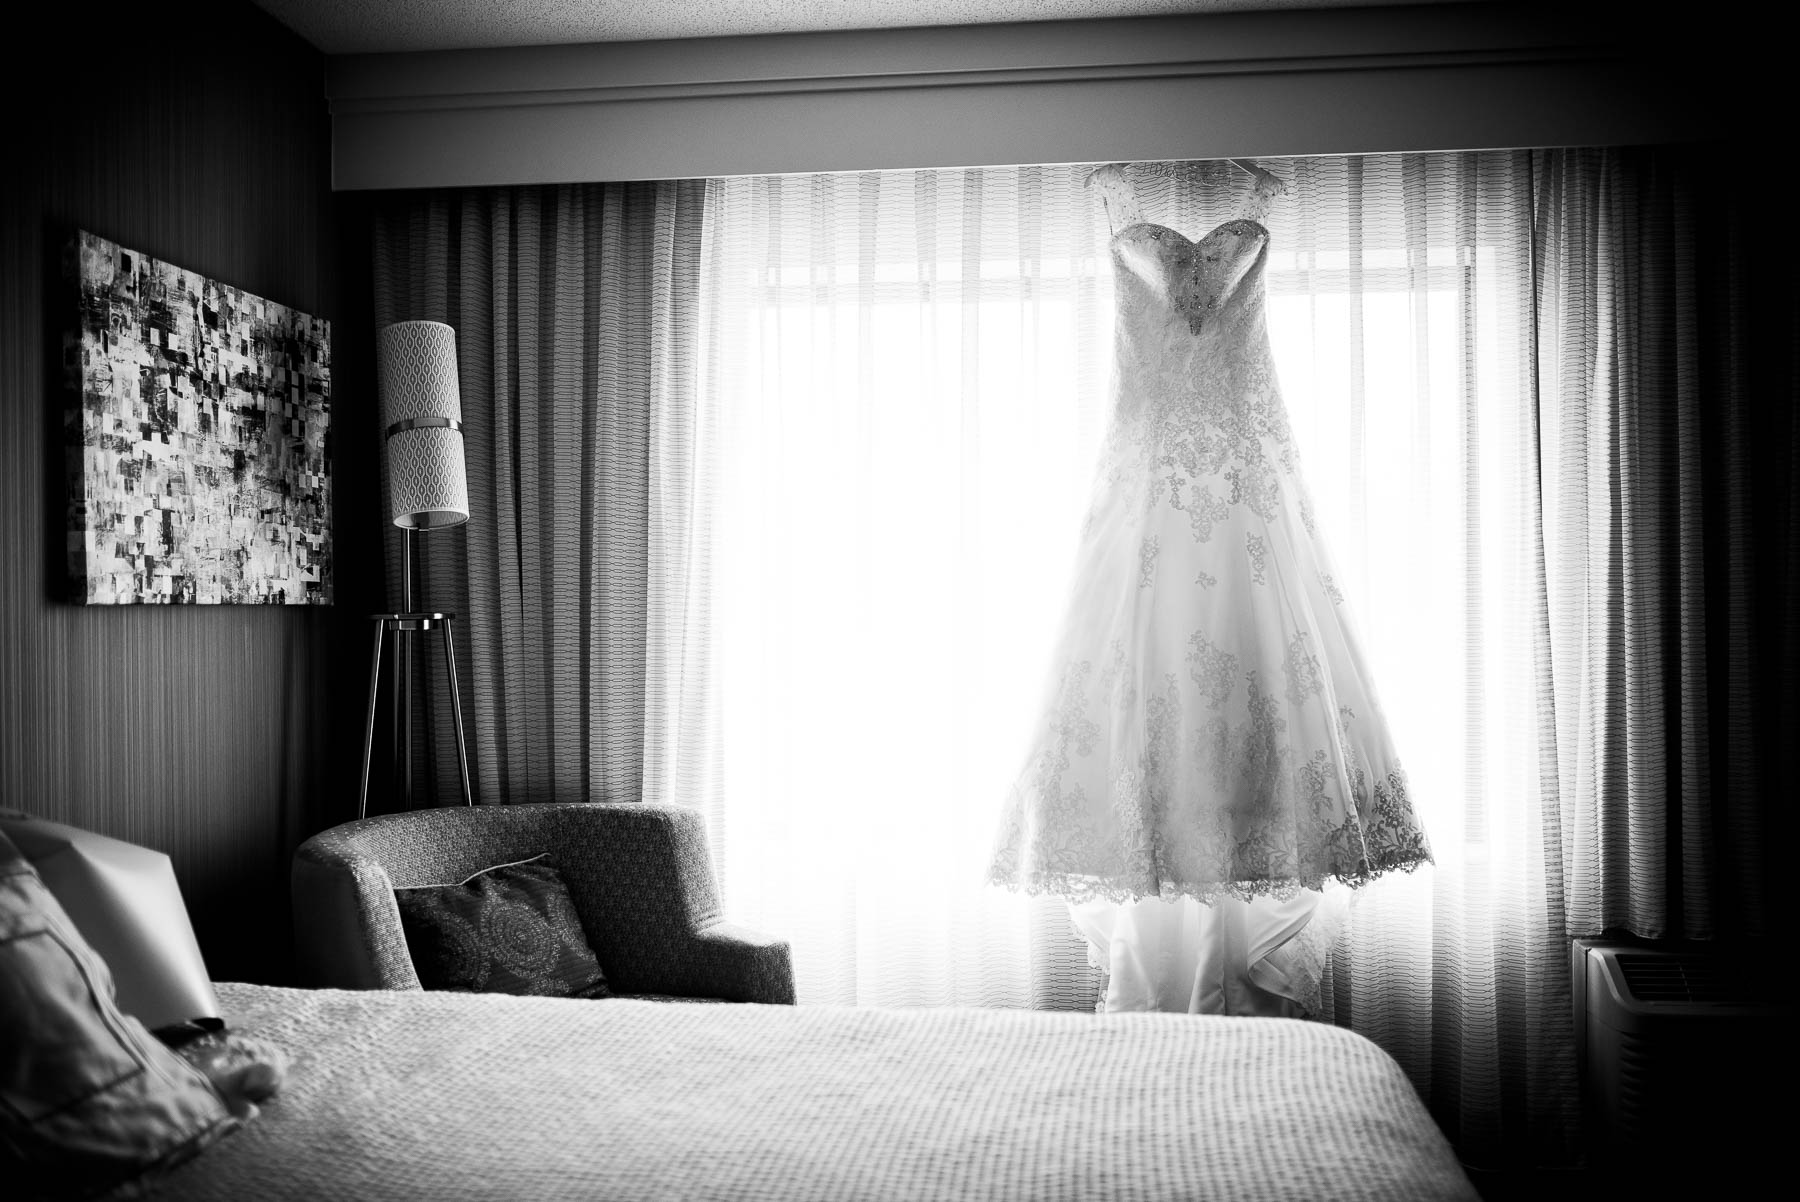 Wedding dress detail photo.